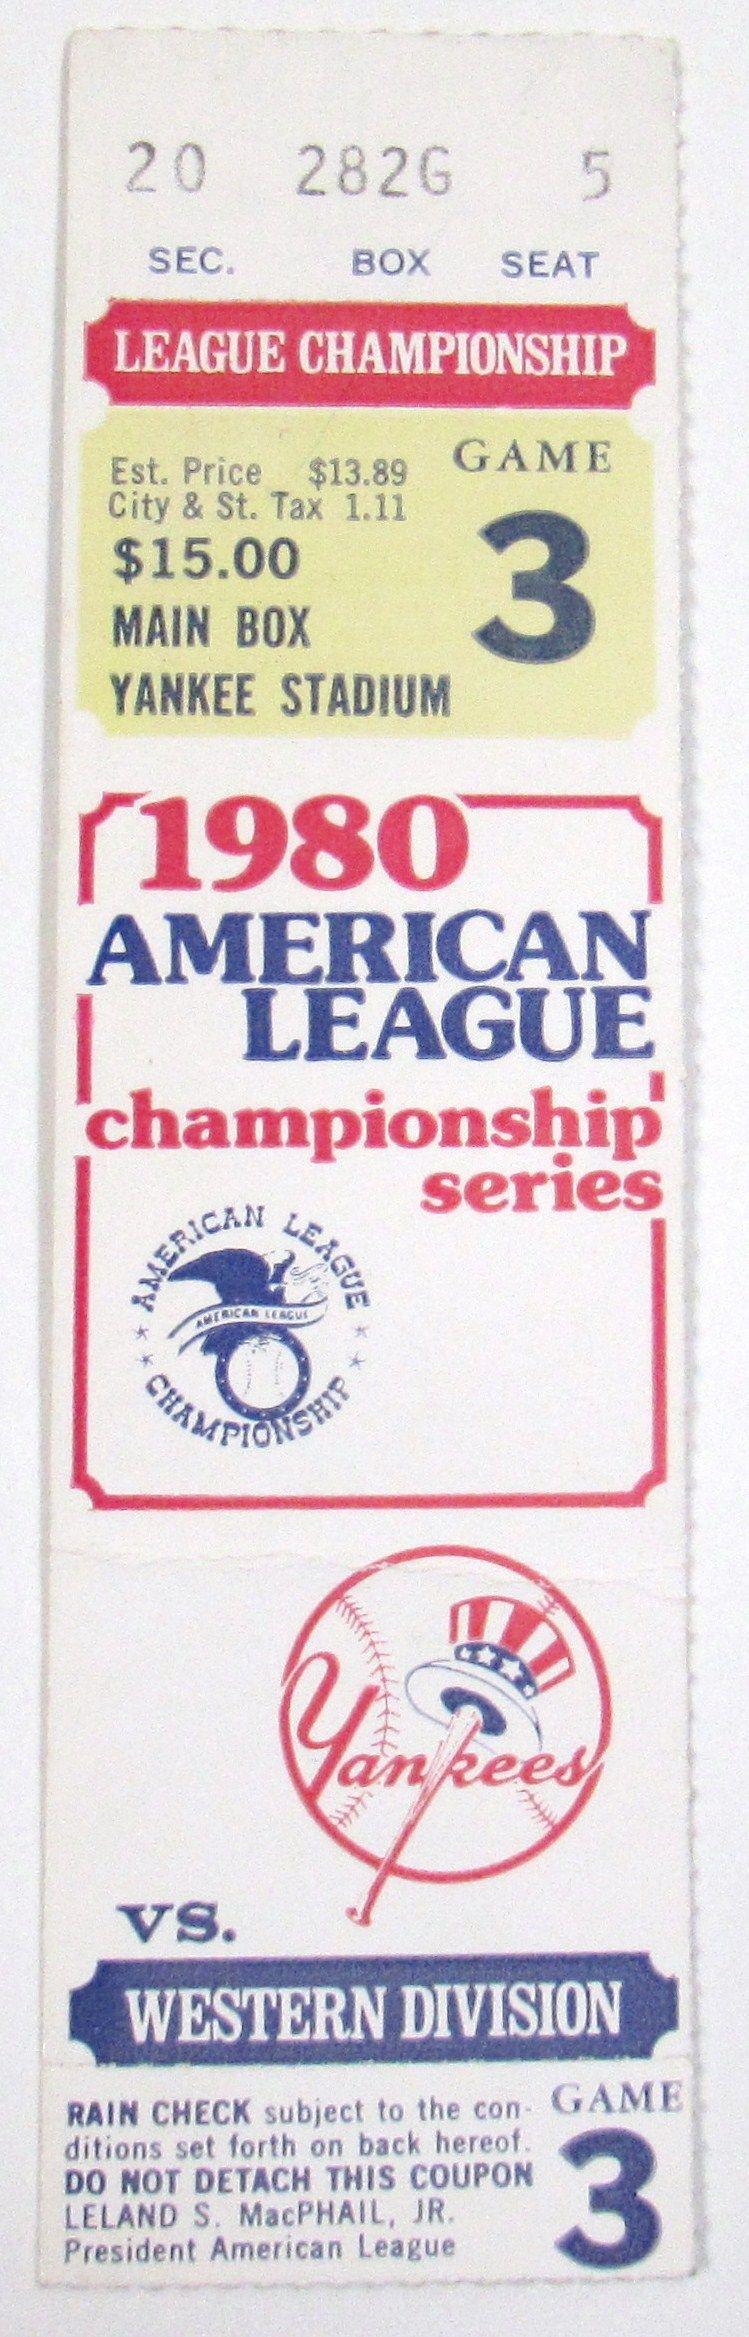 1980 ALCS Game 3 Ticket KC Royals Vs New York Yankees